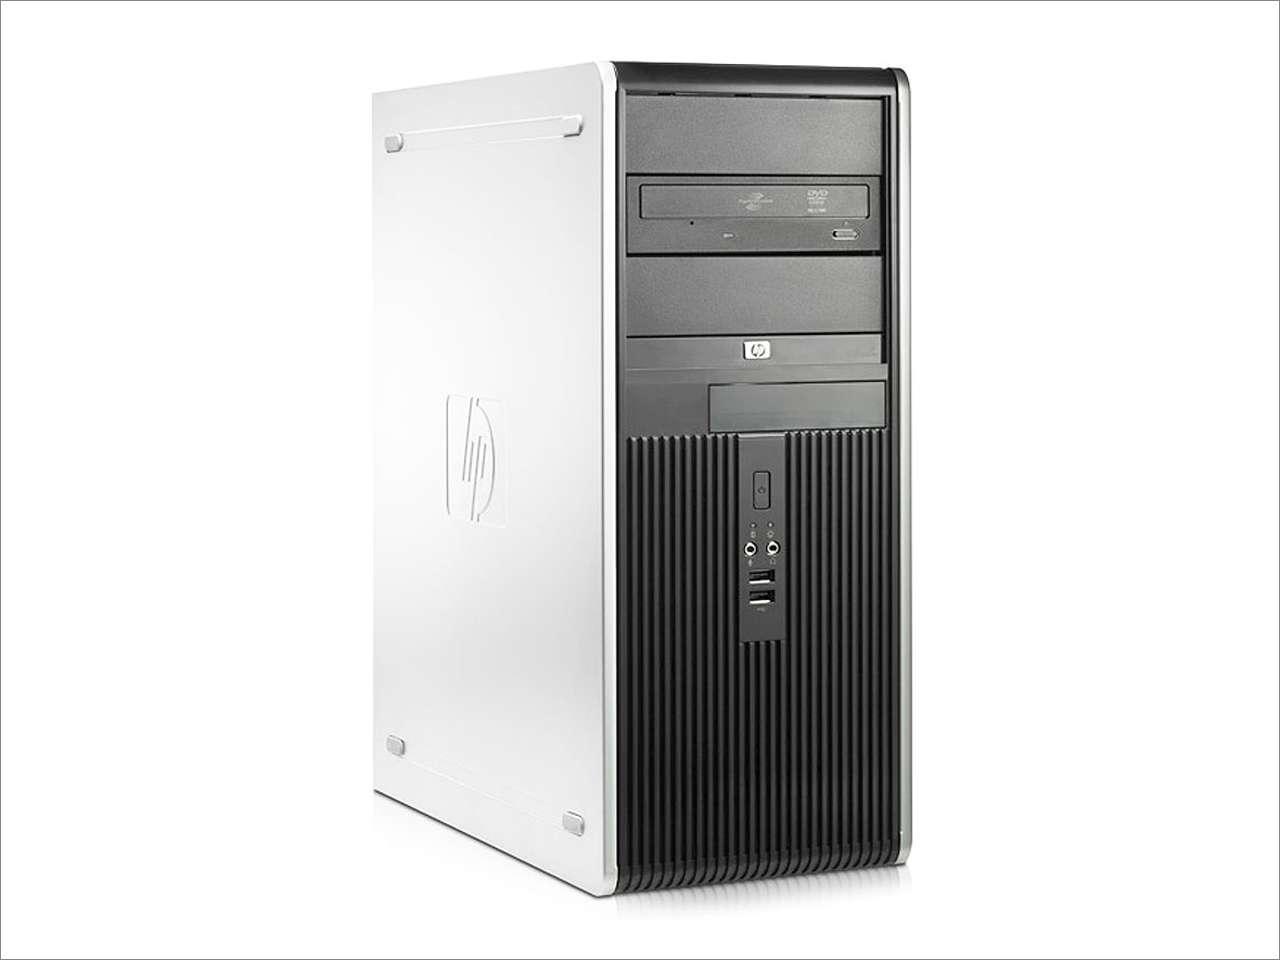 PC HP DC7900 C2D 3GHz/2GB/160GB/Win7